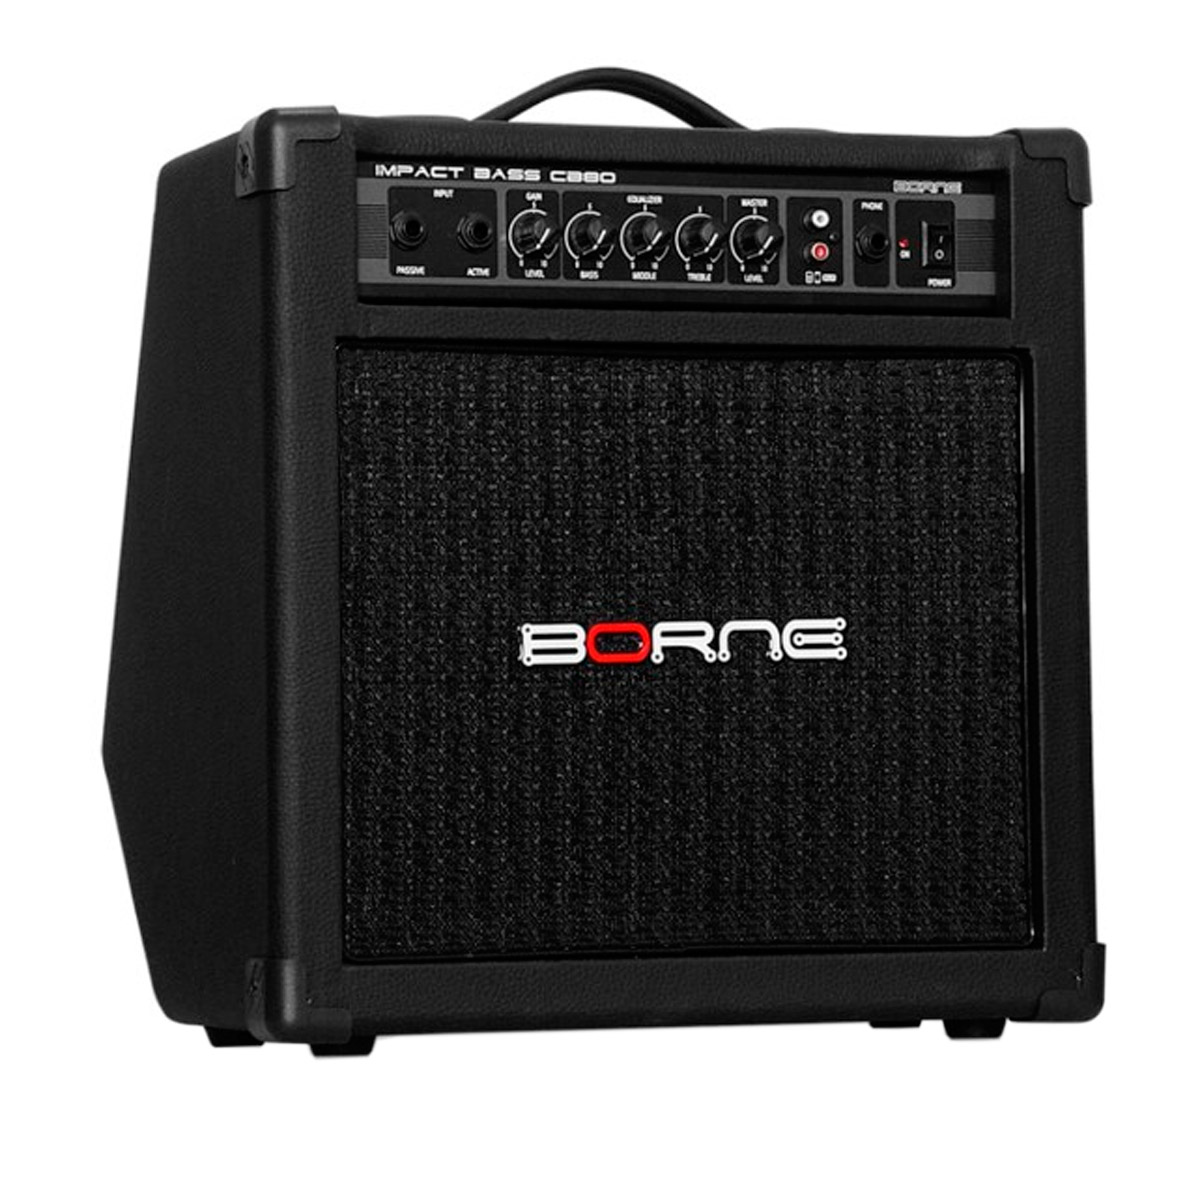 CB80 - Amplificador Combo p/ Contrabaixo 30W Impact Bass CB 80 - Borne